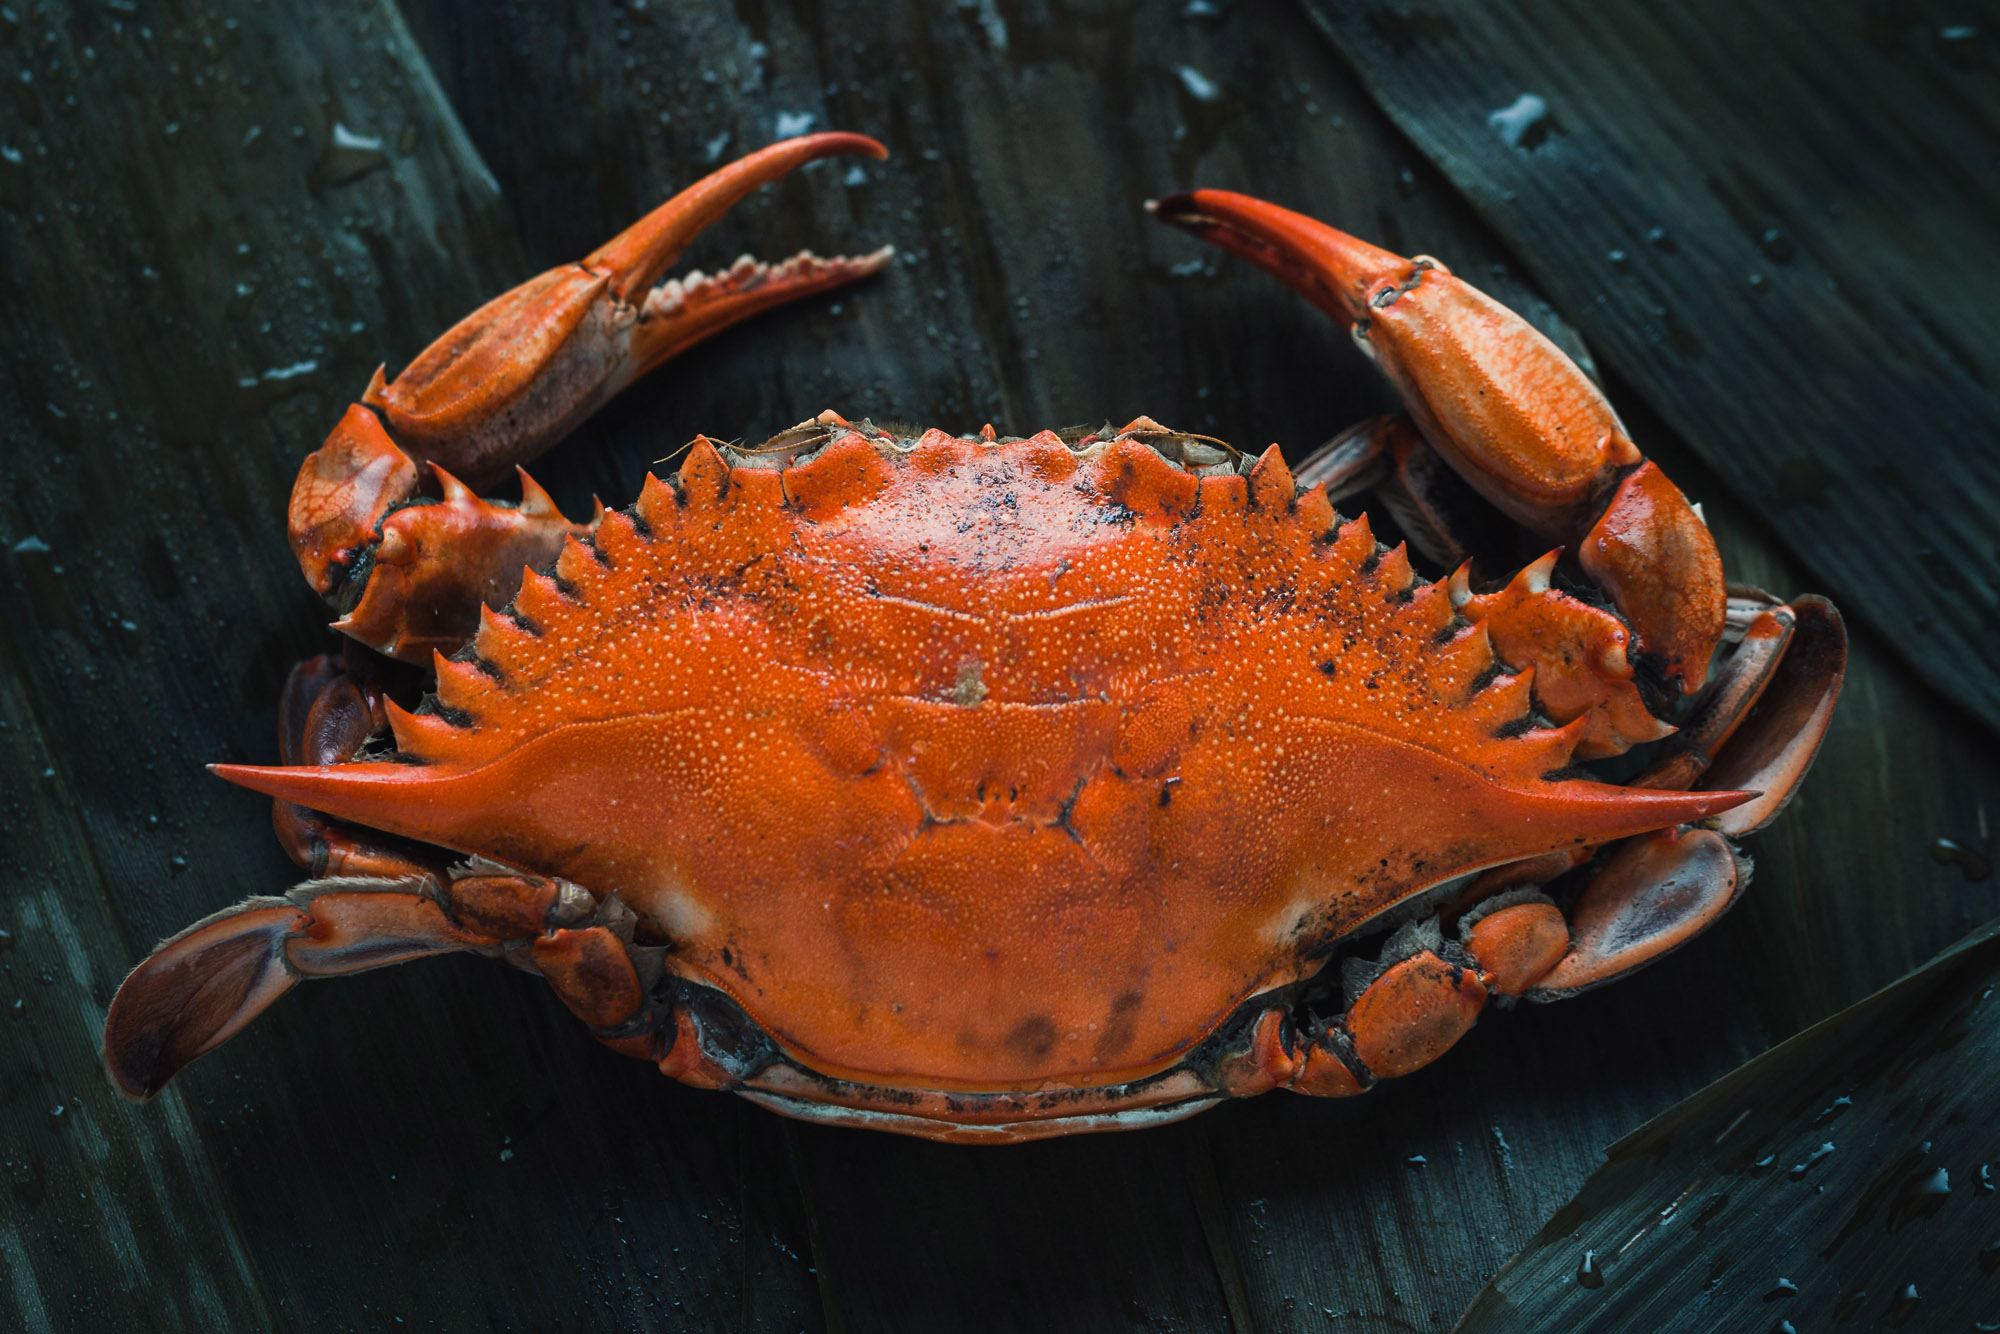 Local crab at The Dornie | Seafood restaurant near Skye